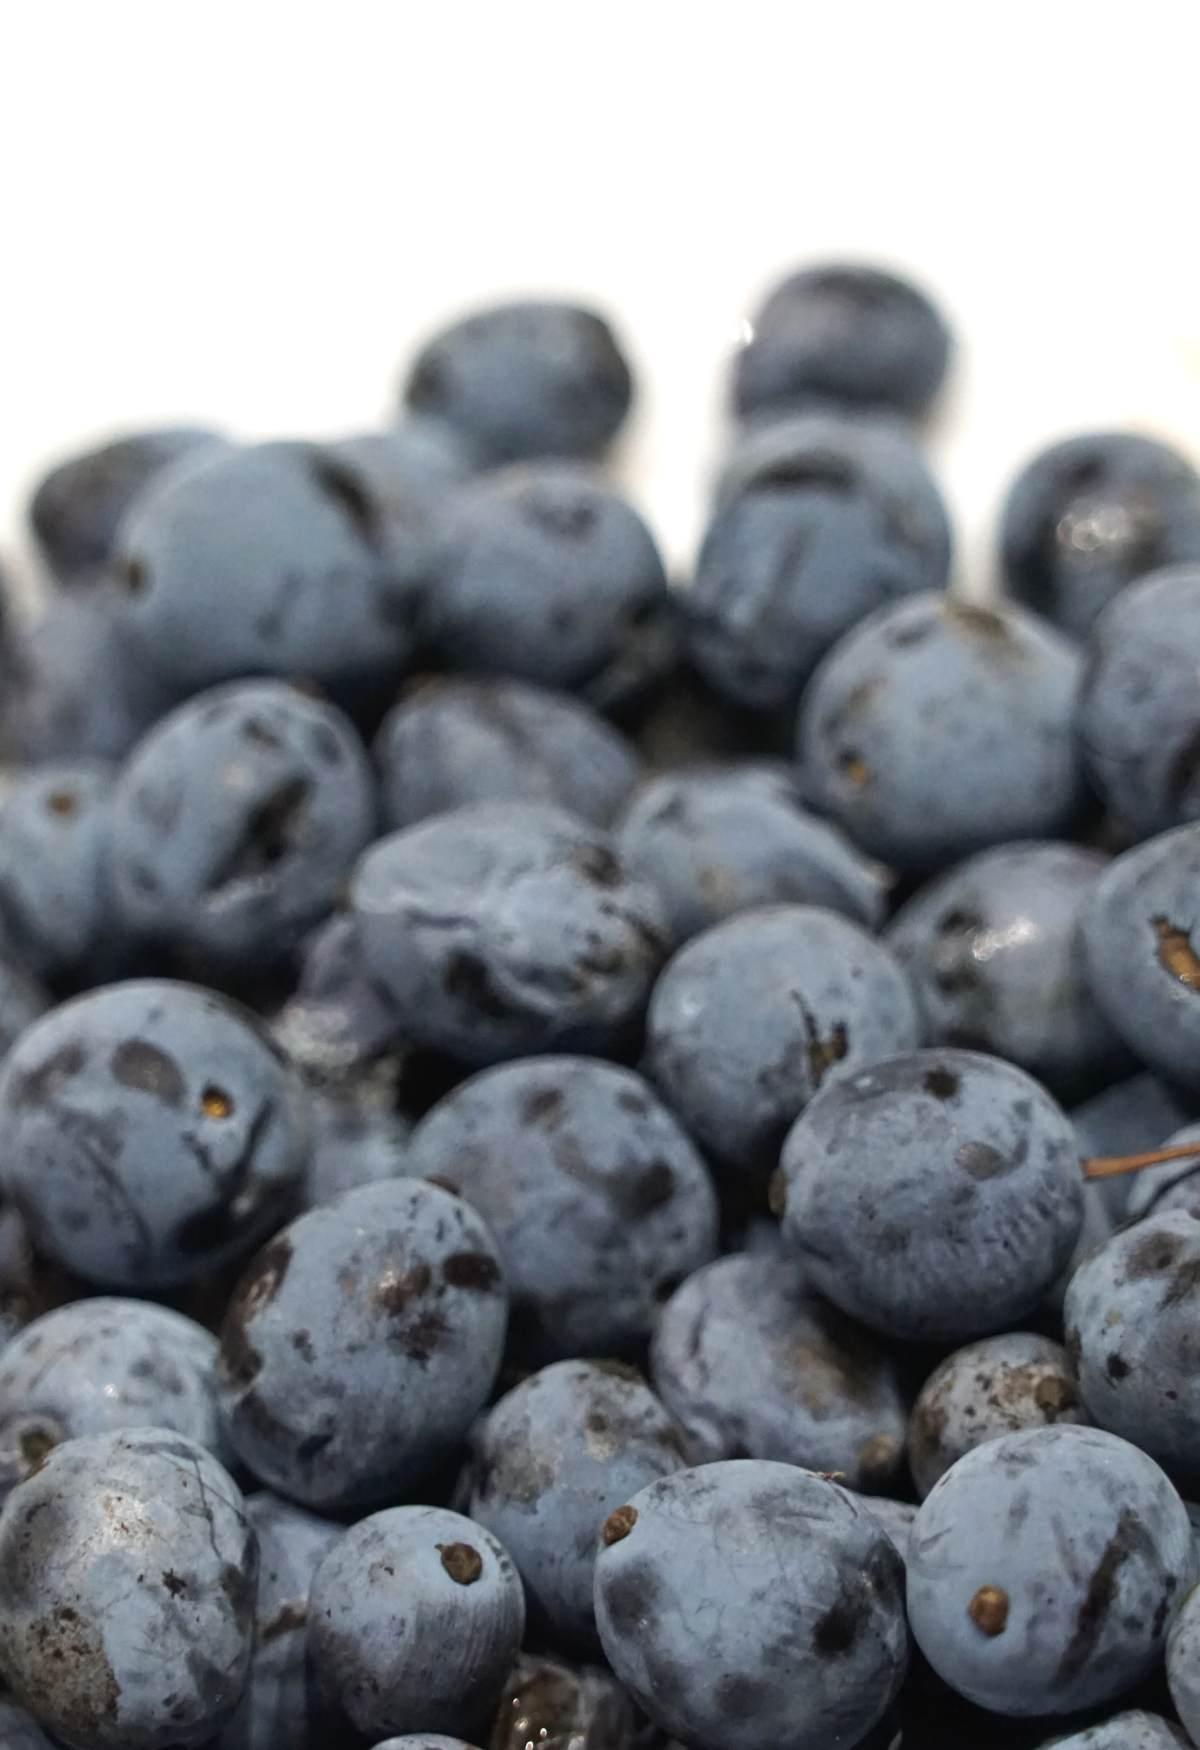 Harvesting Mahonia berries – easy, abundant for tasty toasts & desserts!